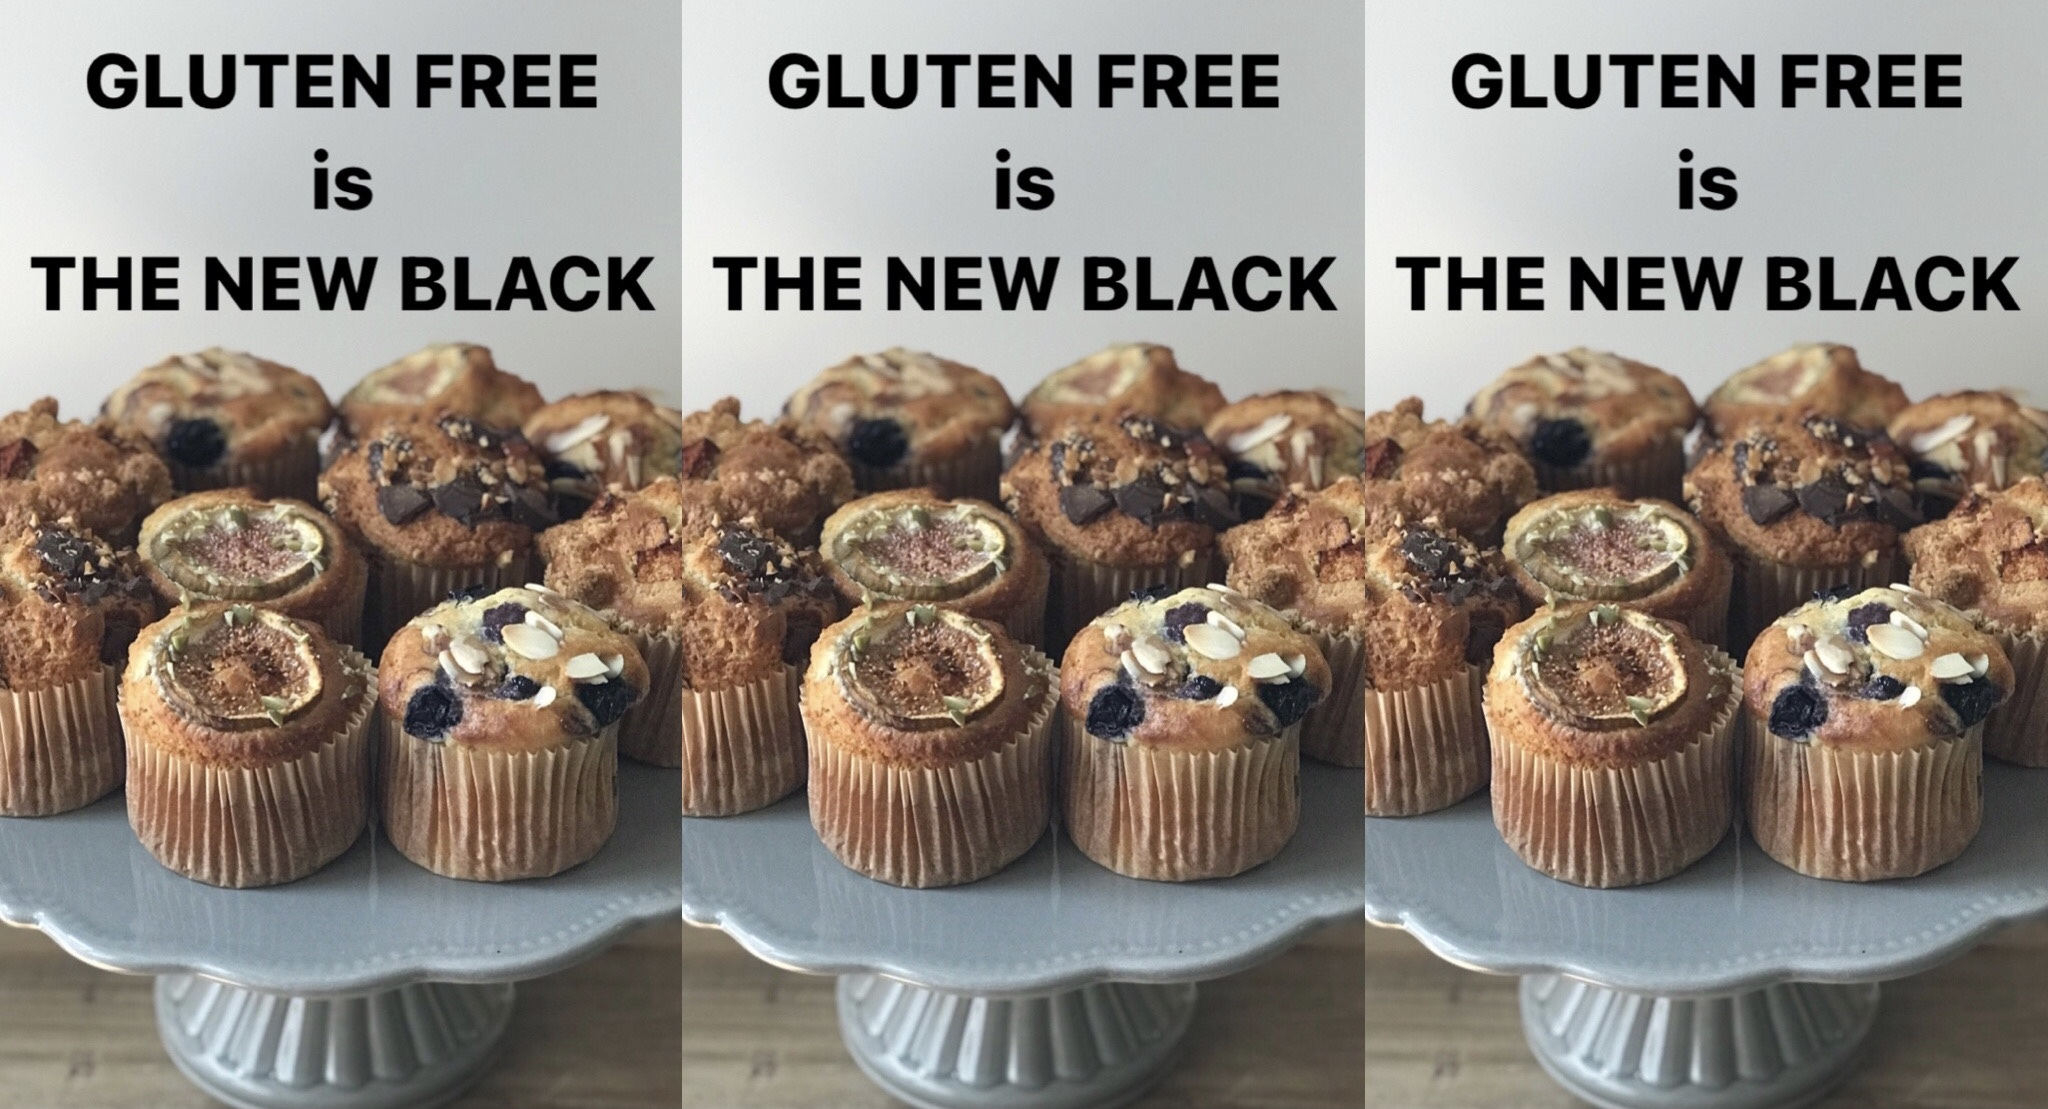 GLUTEN FREE is THE NEW BLACK (グルテンフリー)